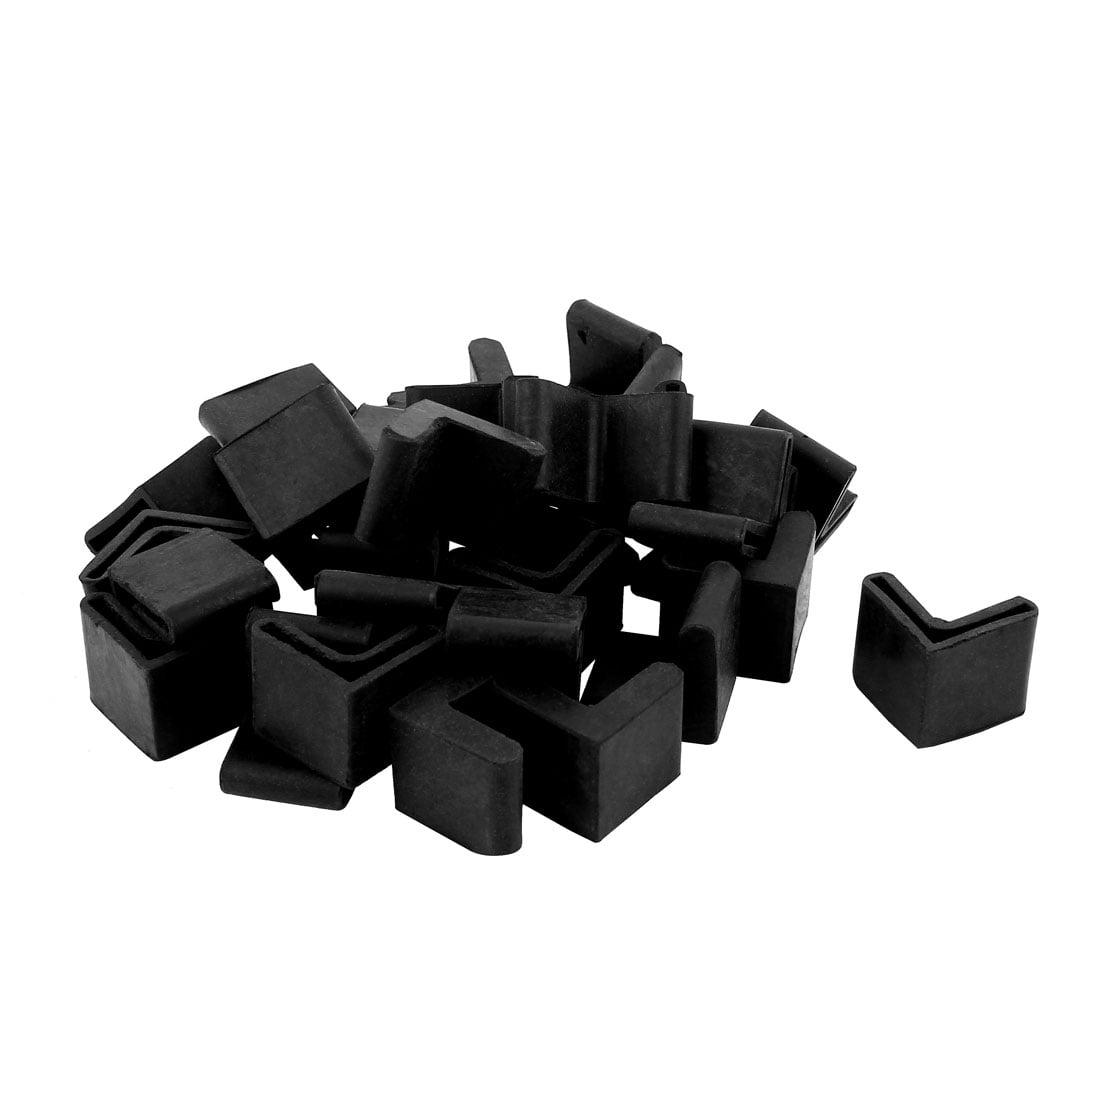 Unique Bargains 30 Pcs Triangle Shaped Furniture Table Corner Cushion Protector 25mmx25mm Black - image 2 de 2